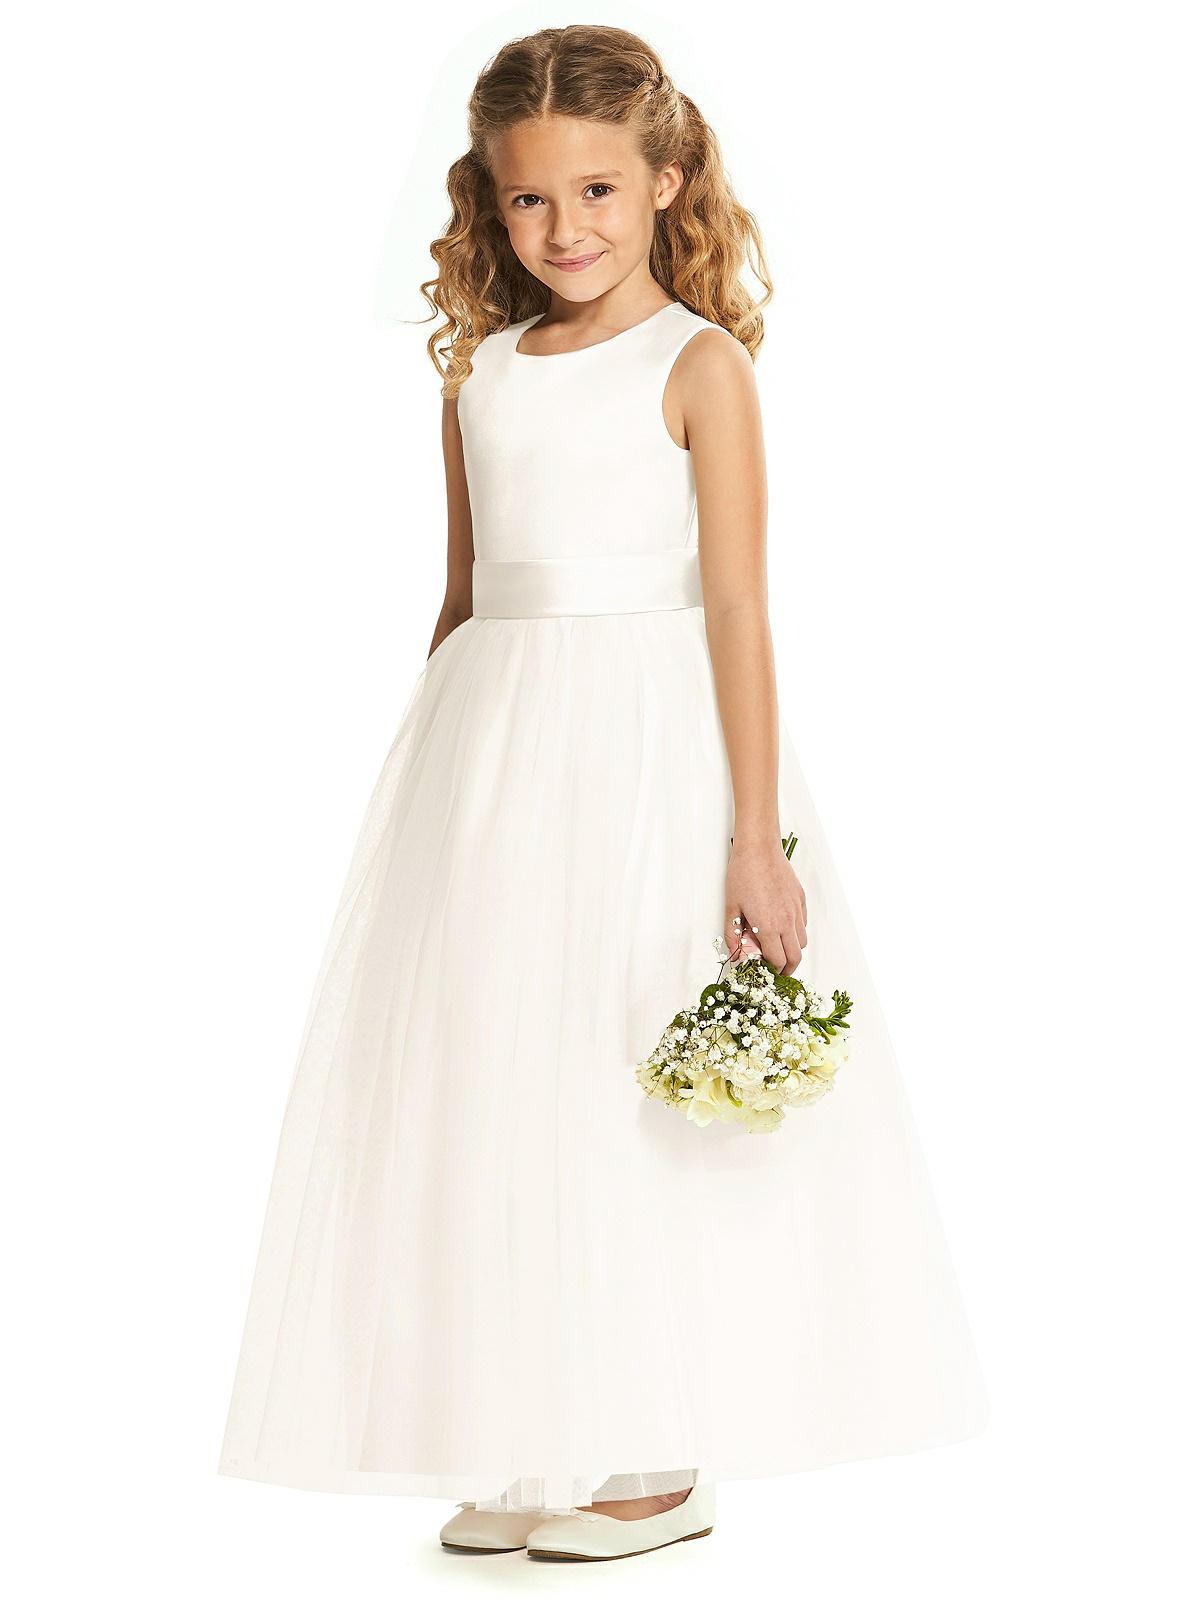 0ff82097d3 Rose Gold And Blush Flower Girl Dress